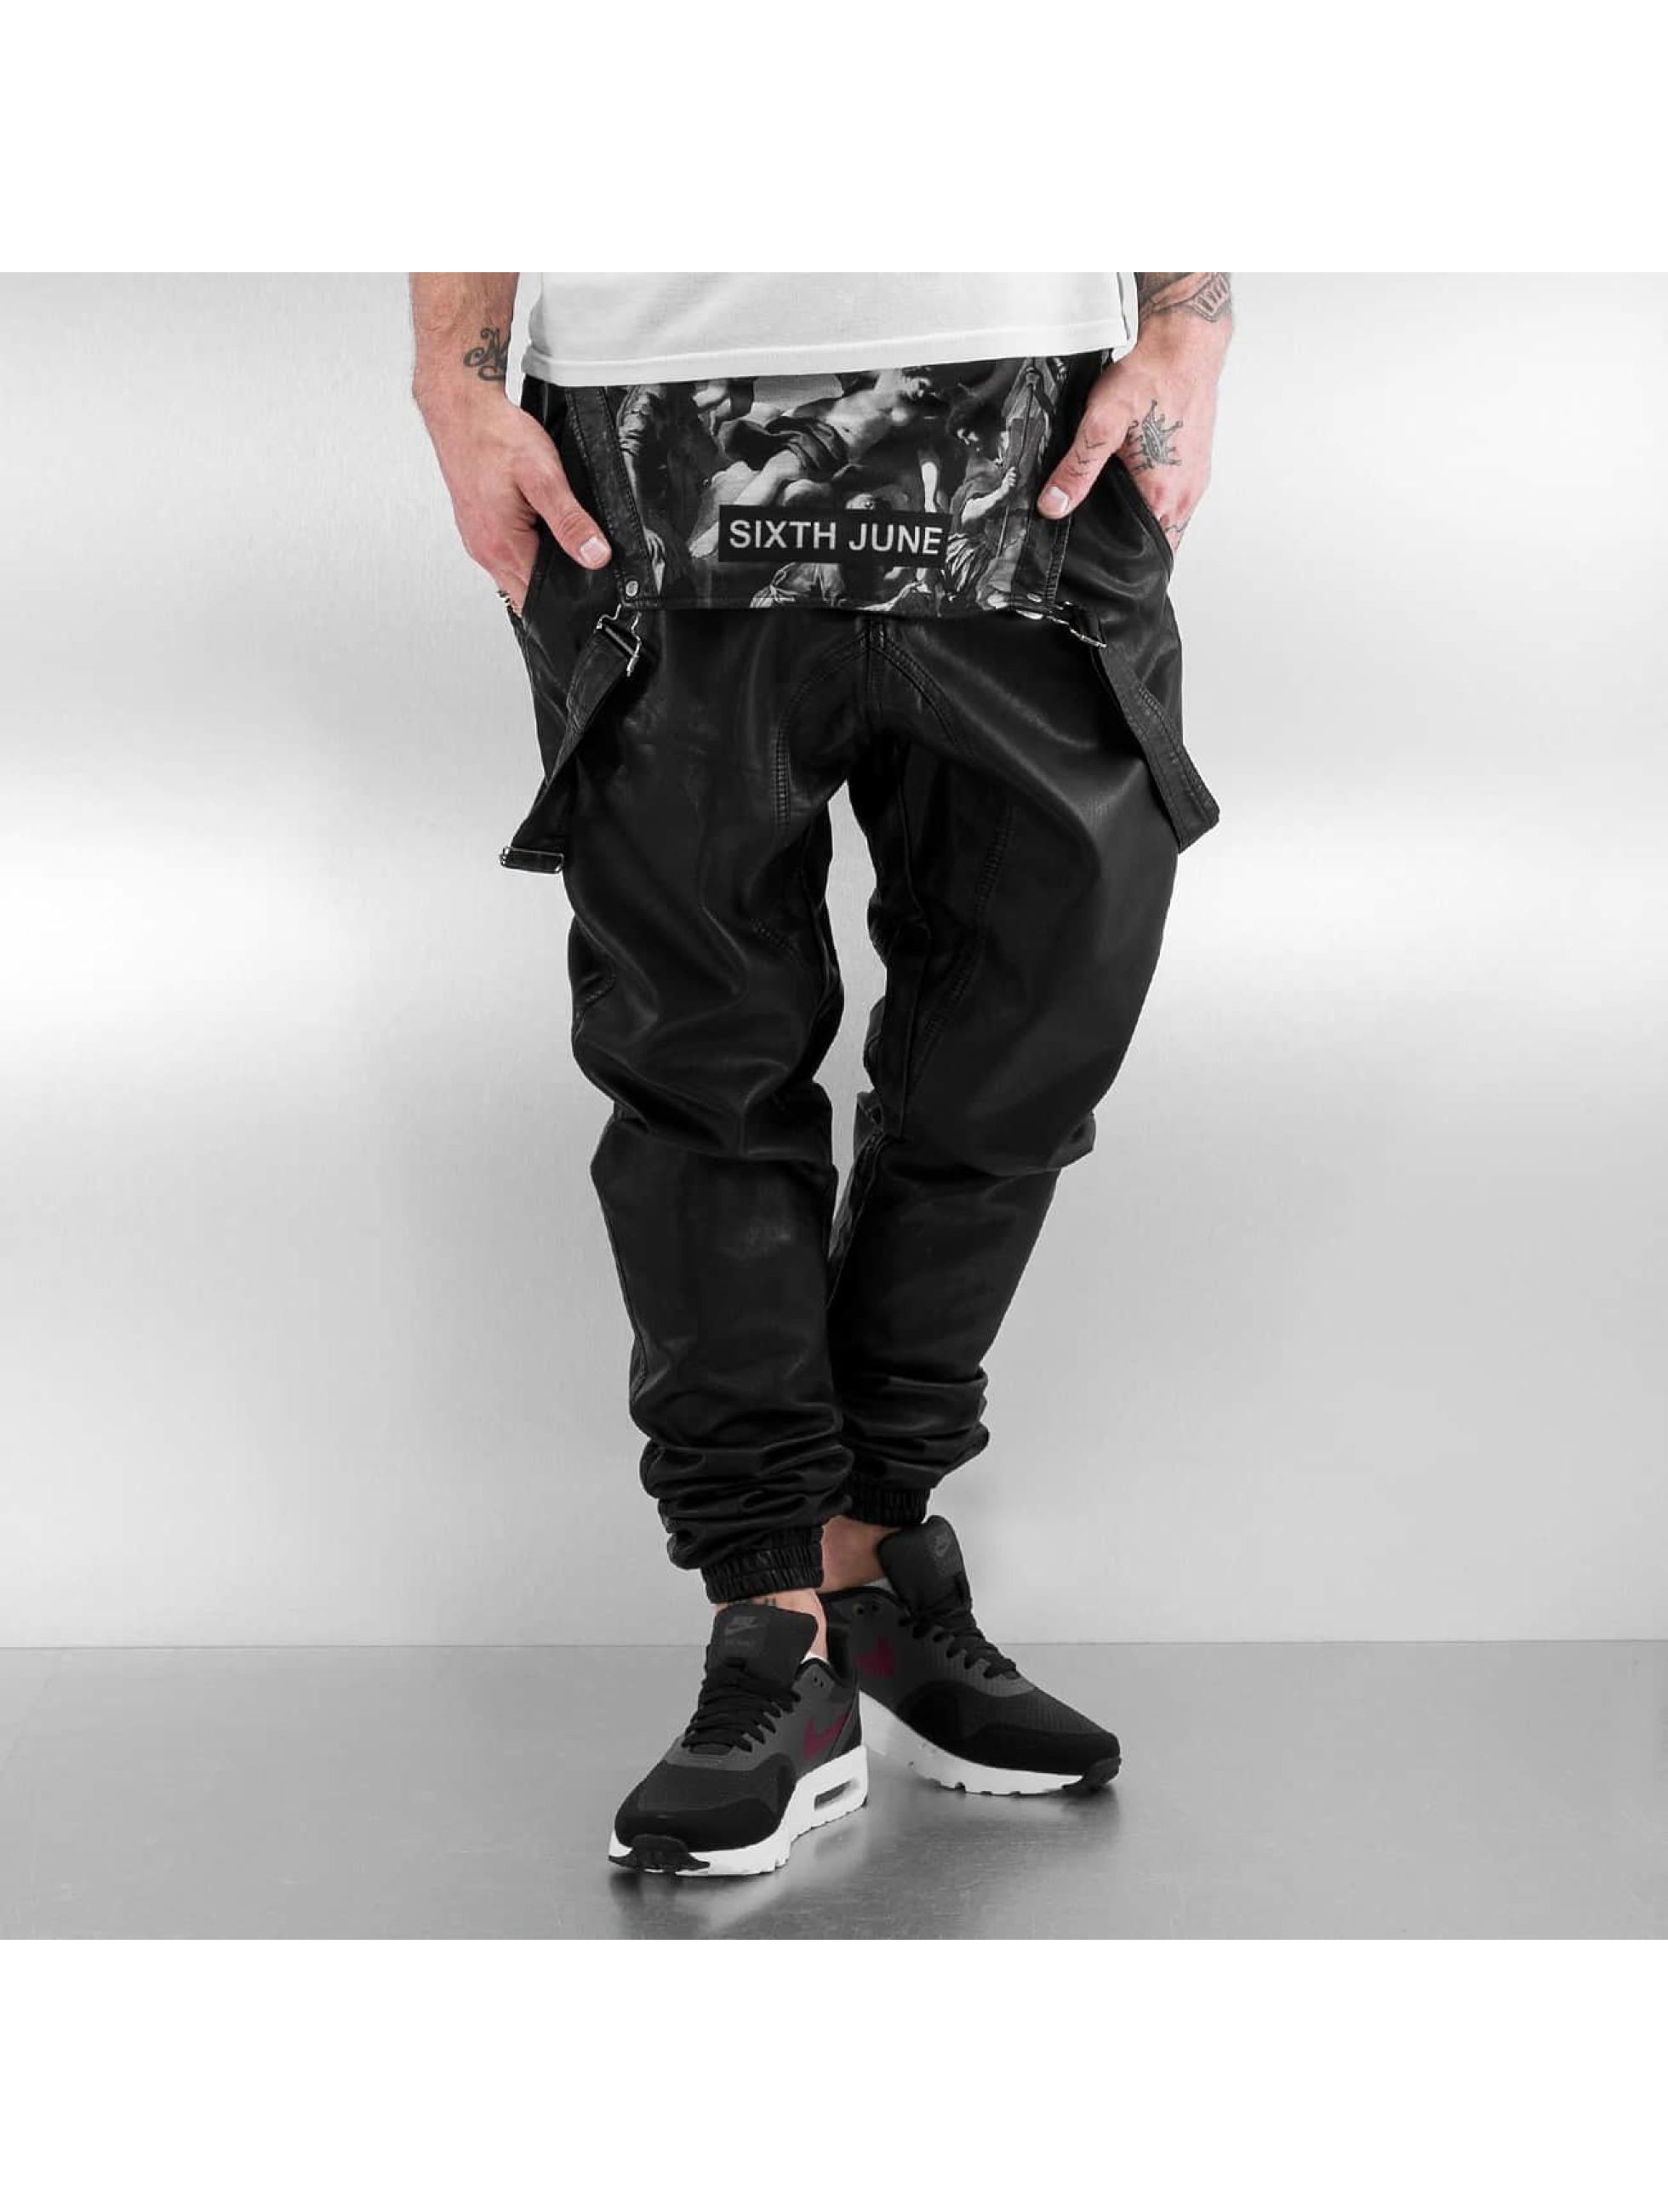 Sixth June Renaissance Sweat Pants Black II